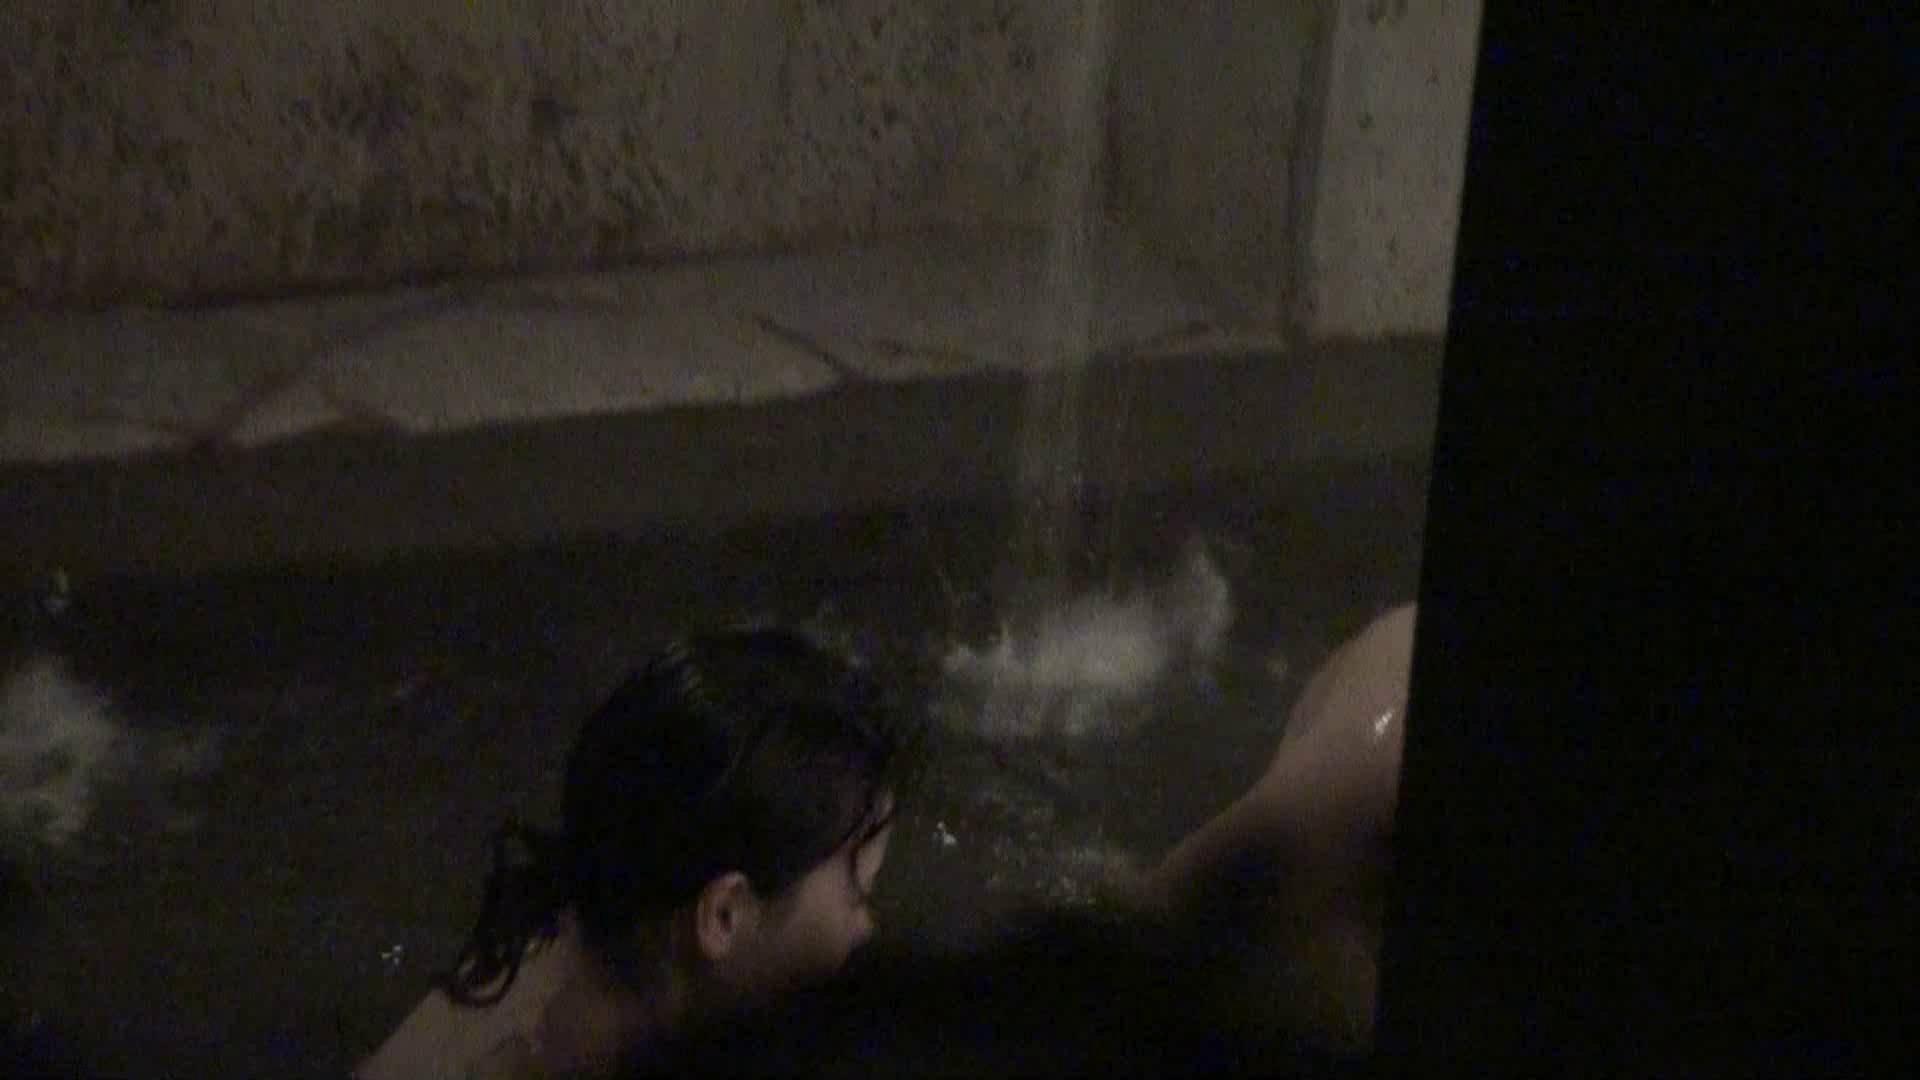 Aquaな露天風呂Vol.402 盗撮 ヌード画像 88画像 80